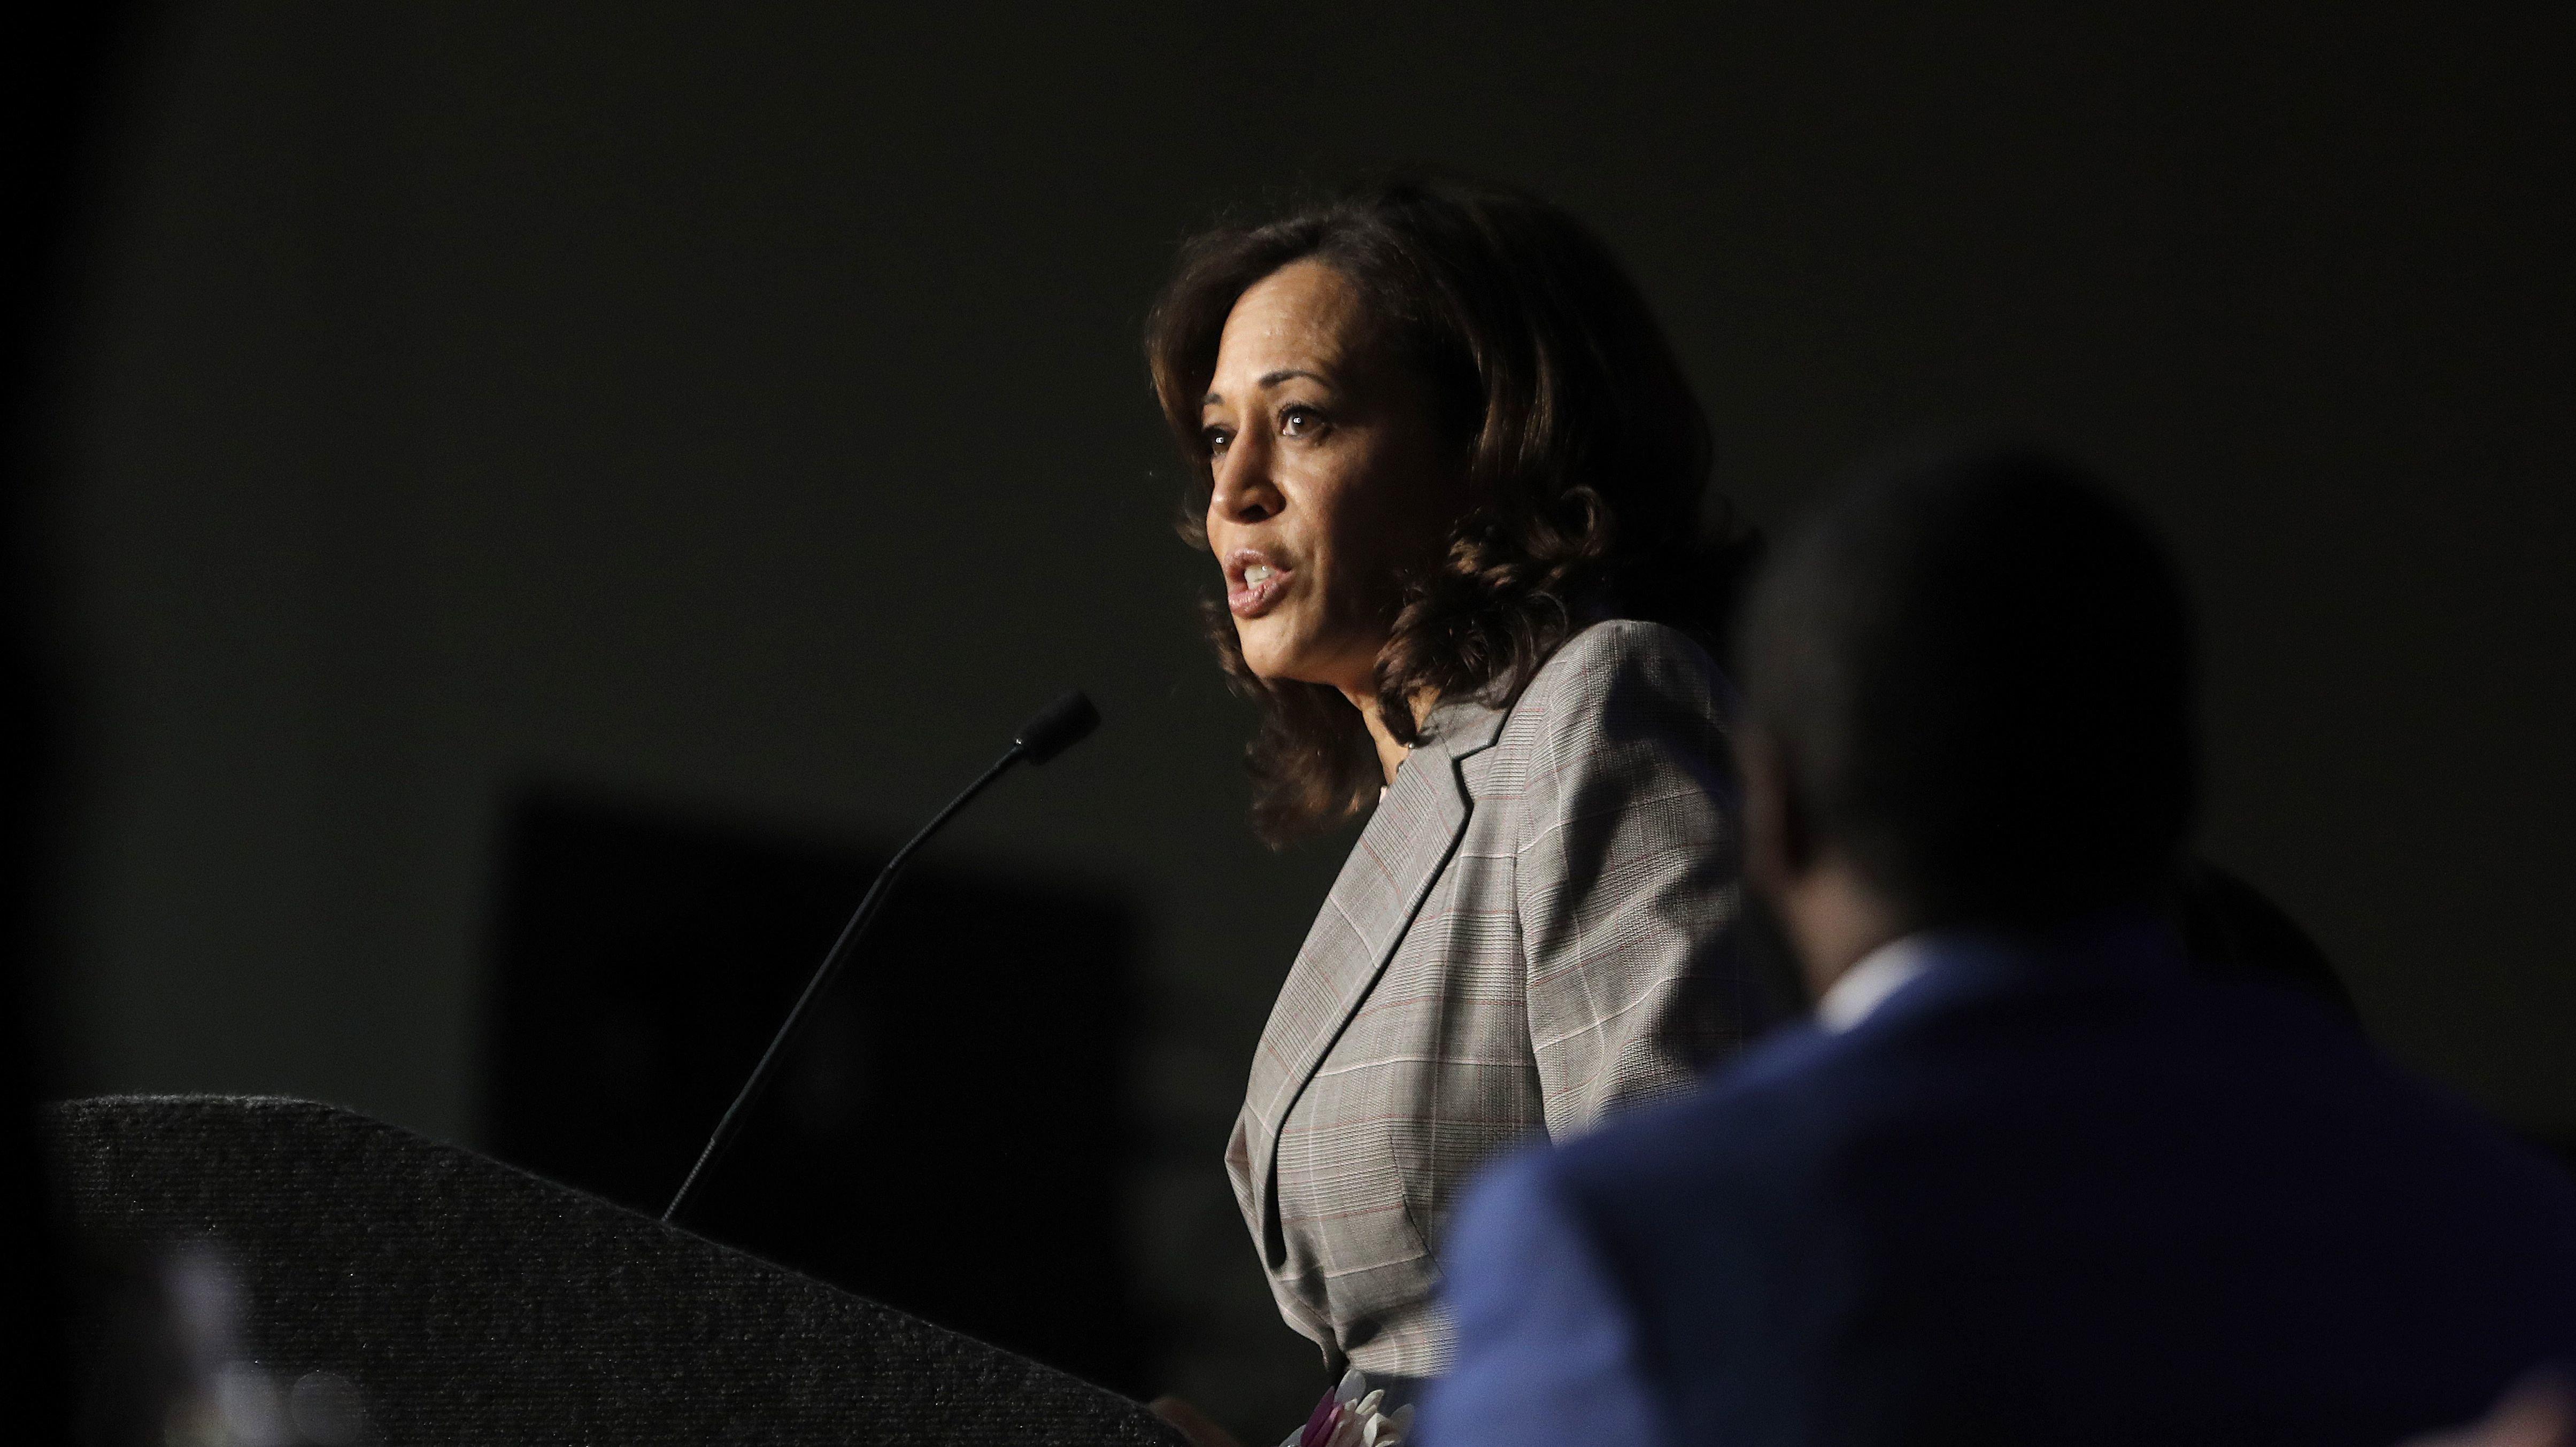 Kamala Harris Defends Her Anti-Truancy Efforts